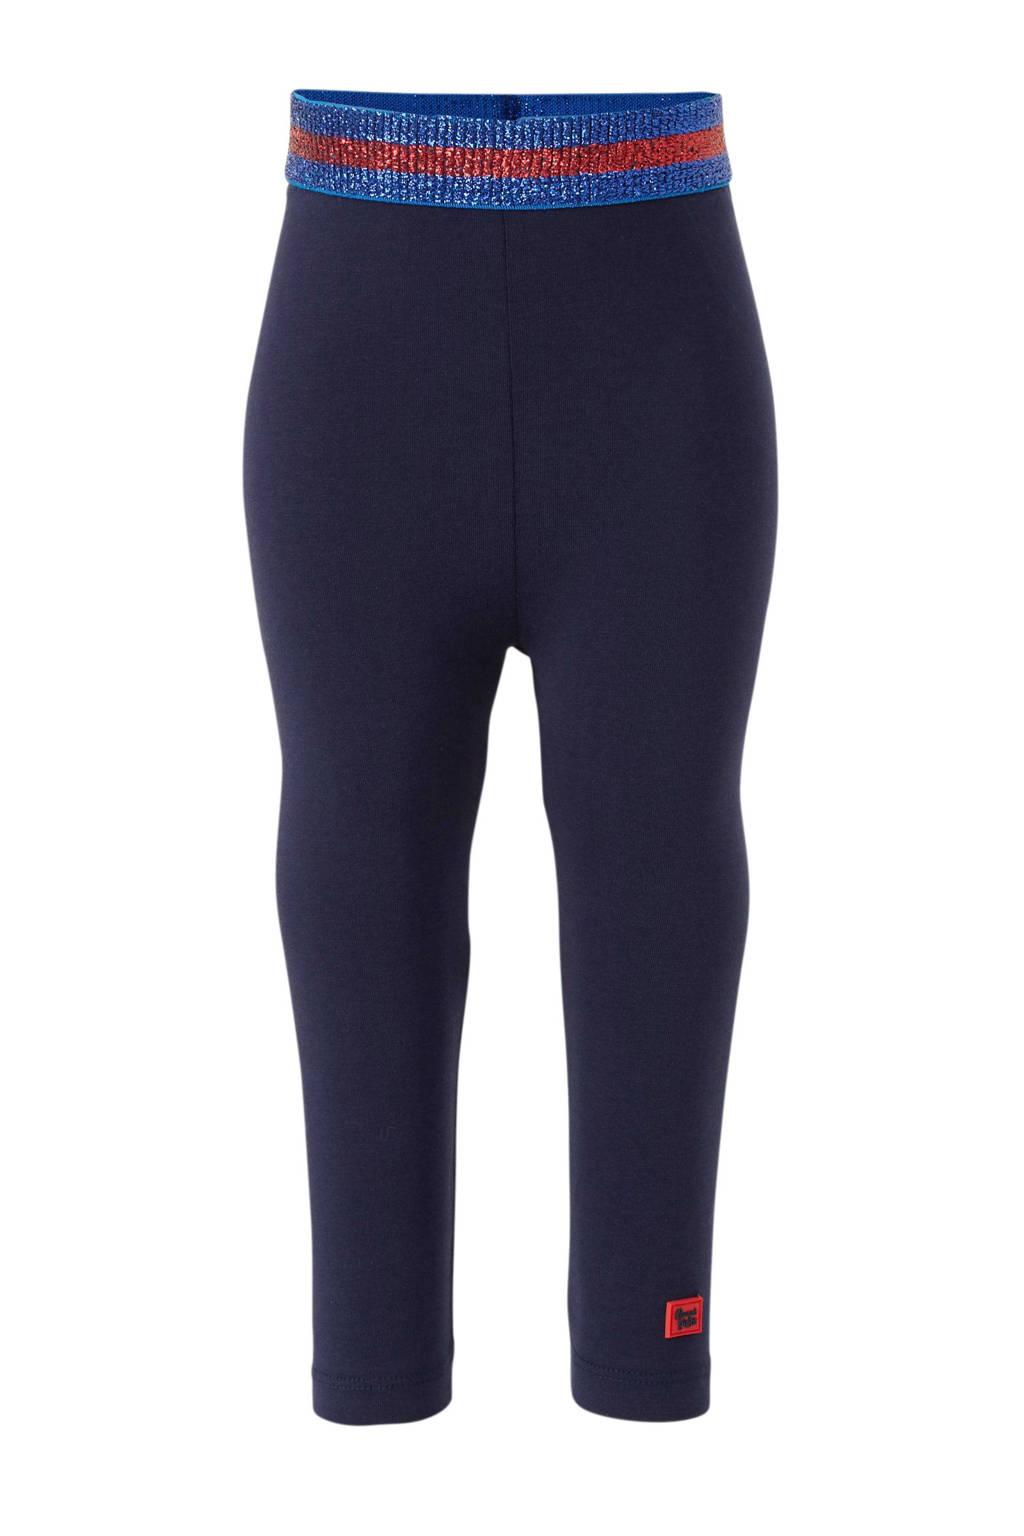 Quapi legging Vesper donkerblauw, Donkerblauw